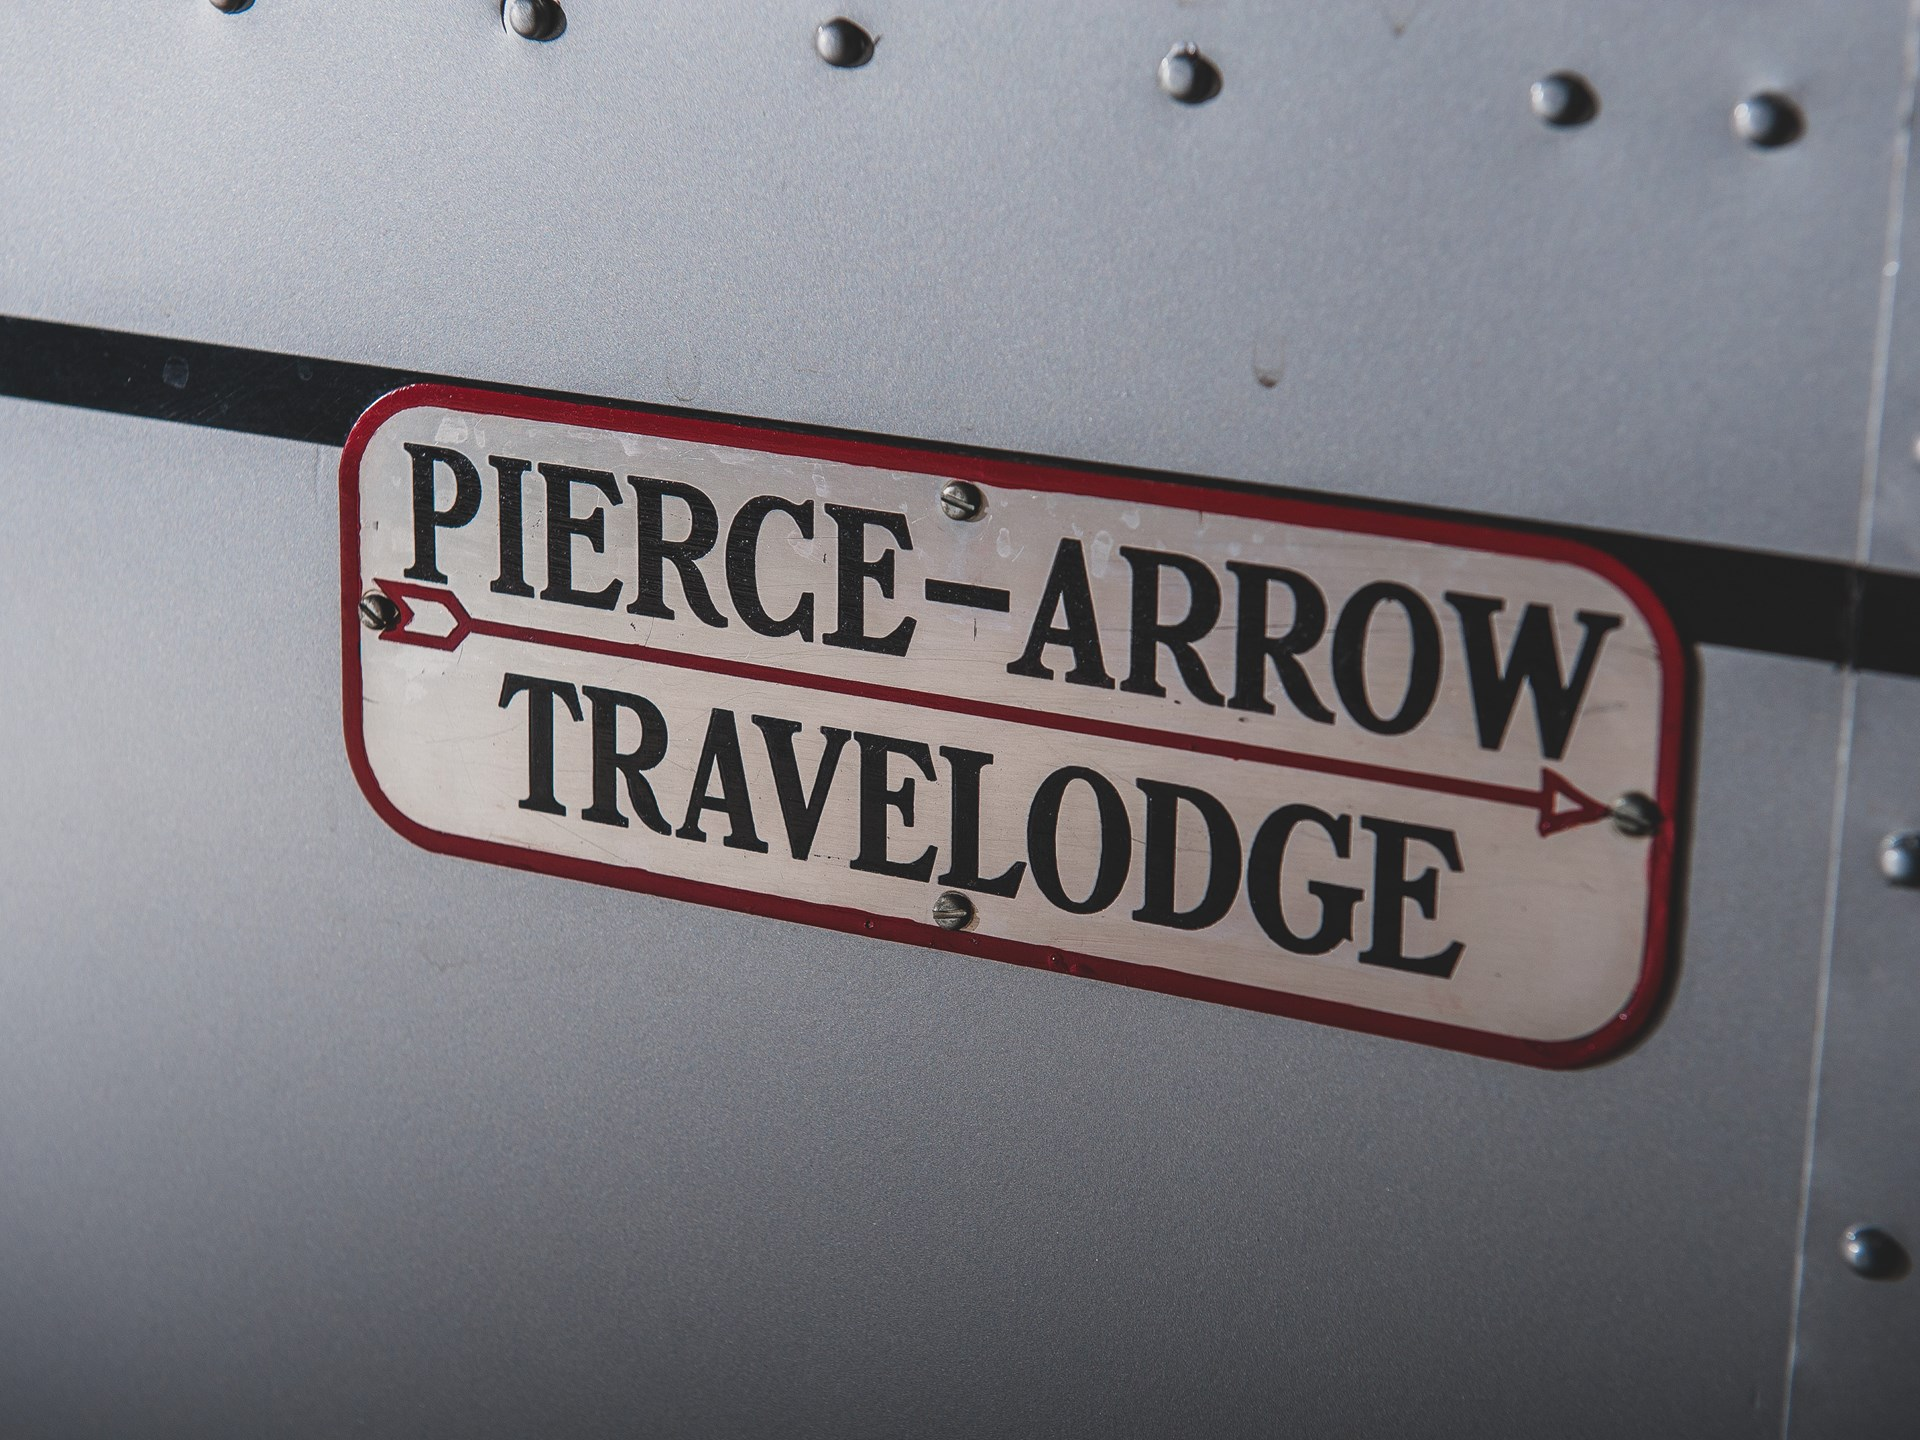 1937 Pierce-Arrow Model C Travelodge name plate